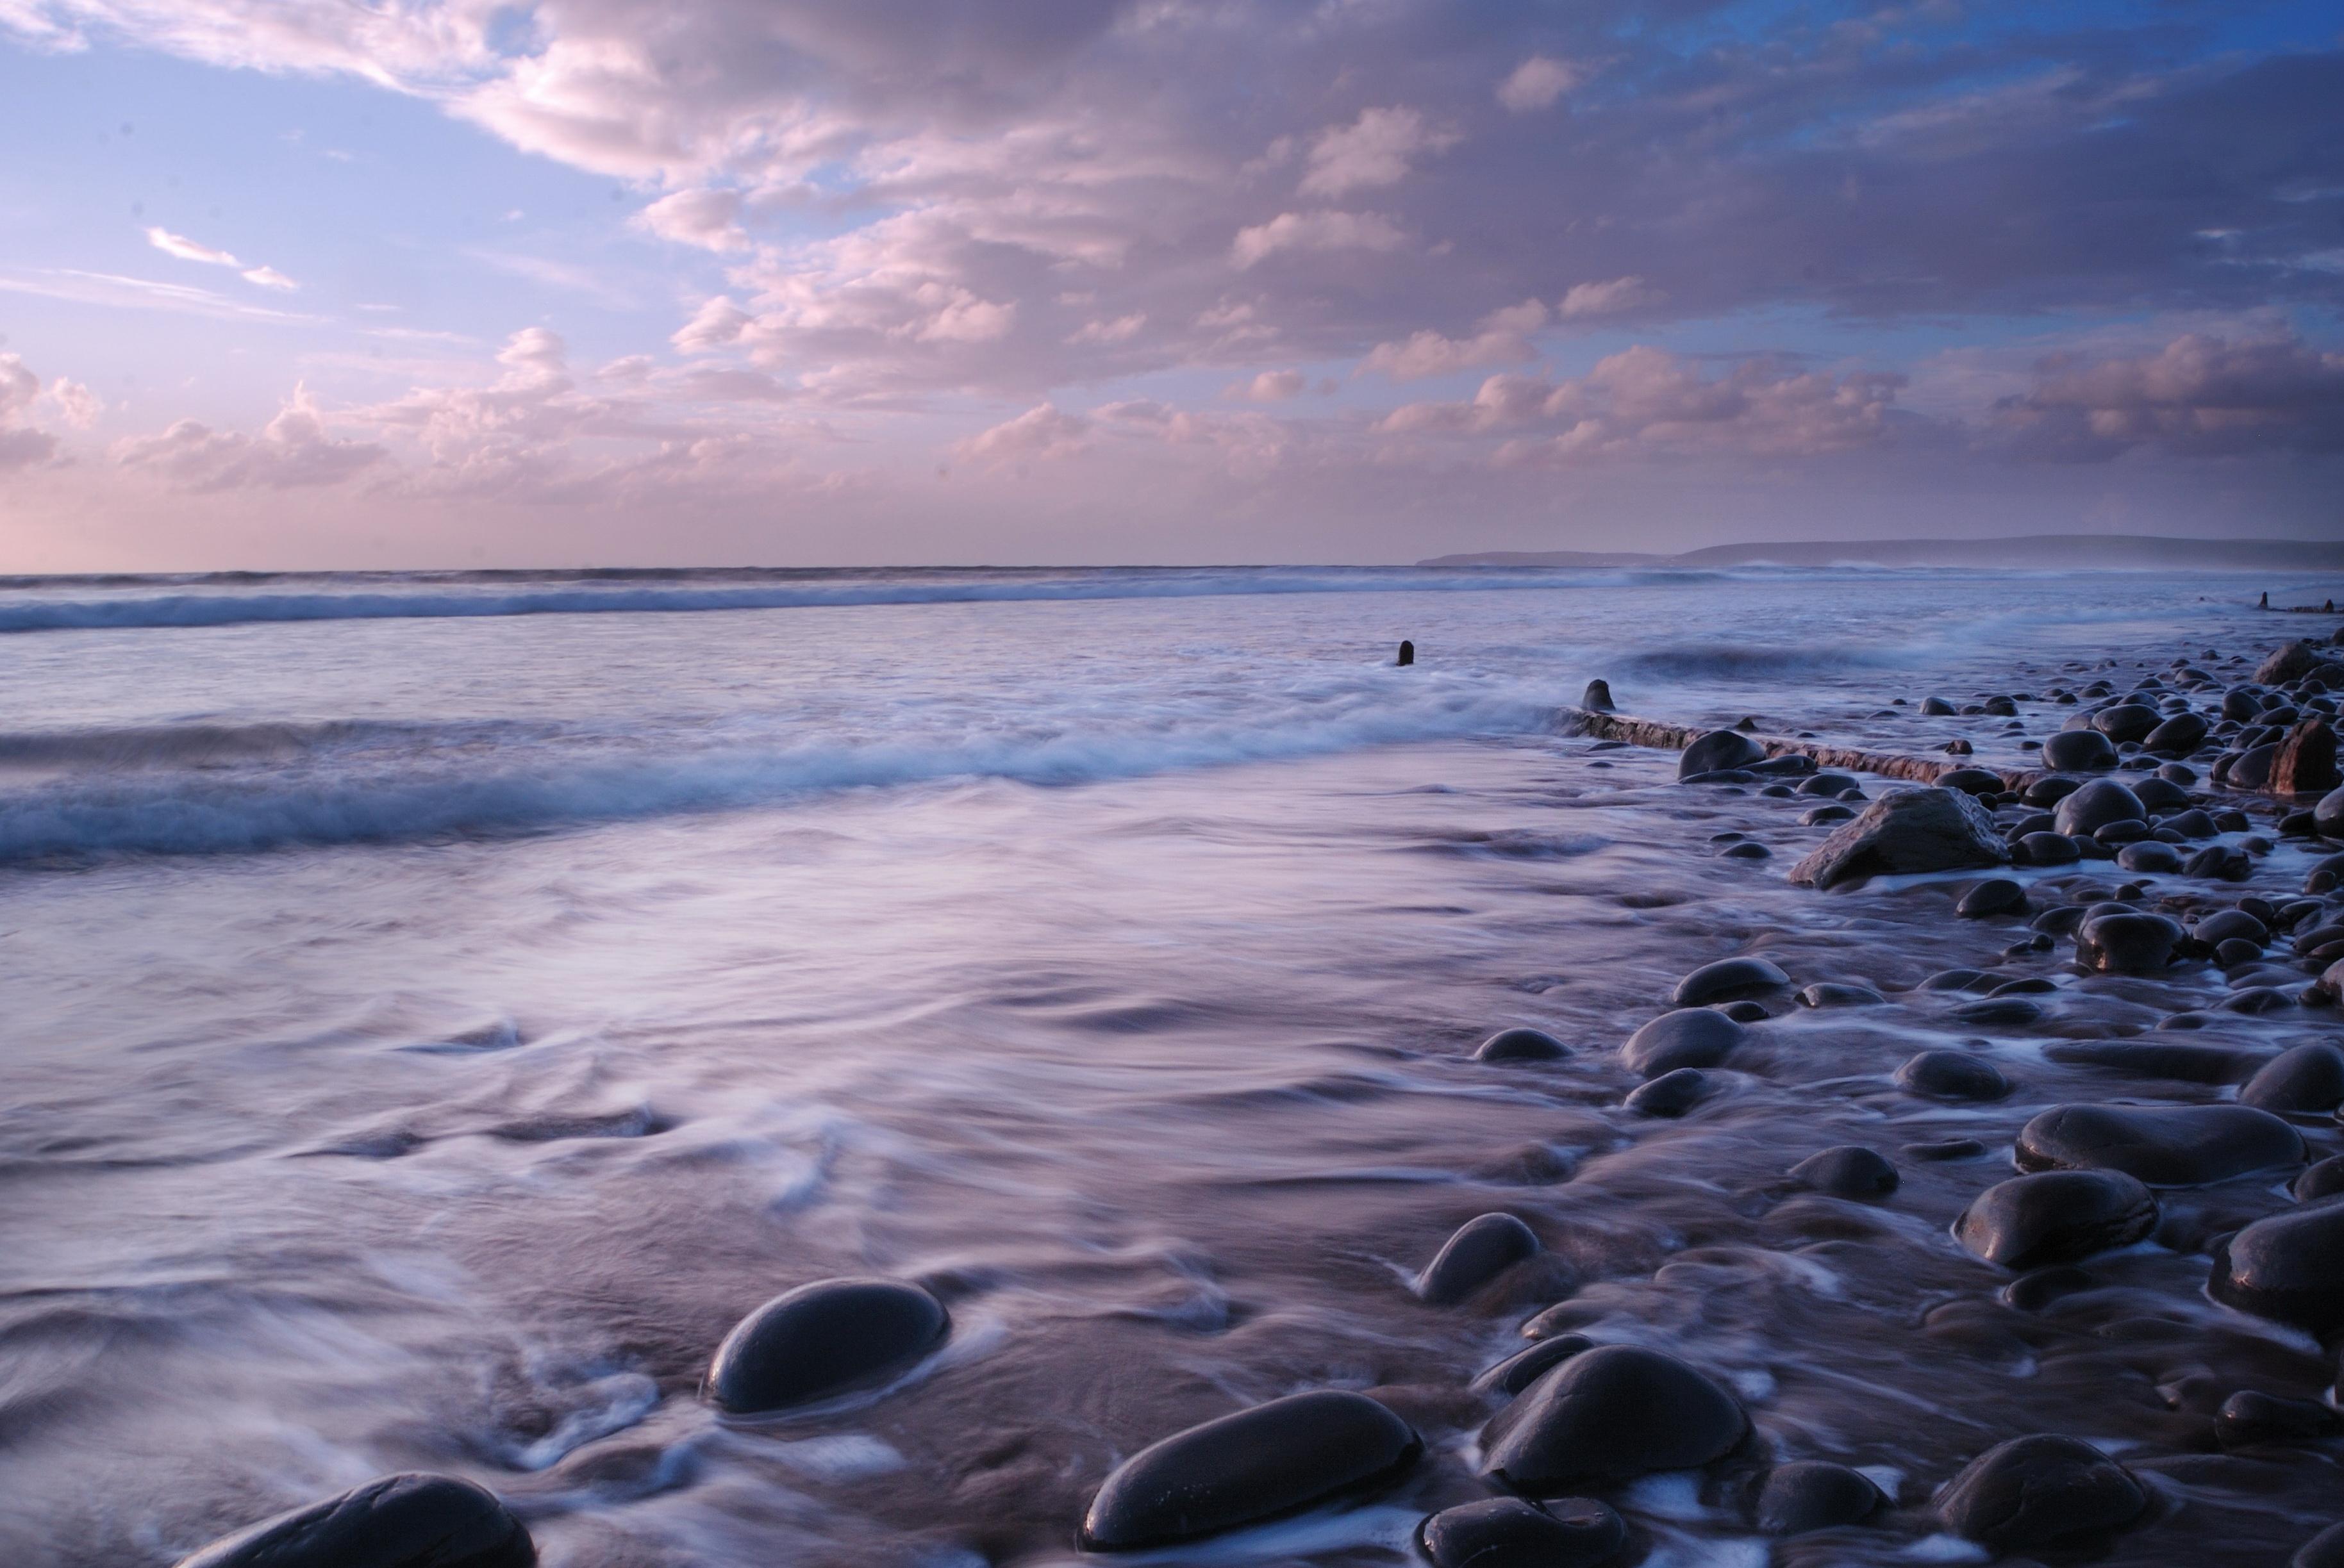 природа море горизонт камни небо облака скачать